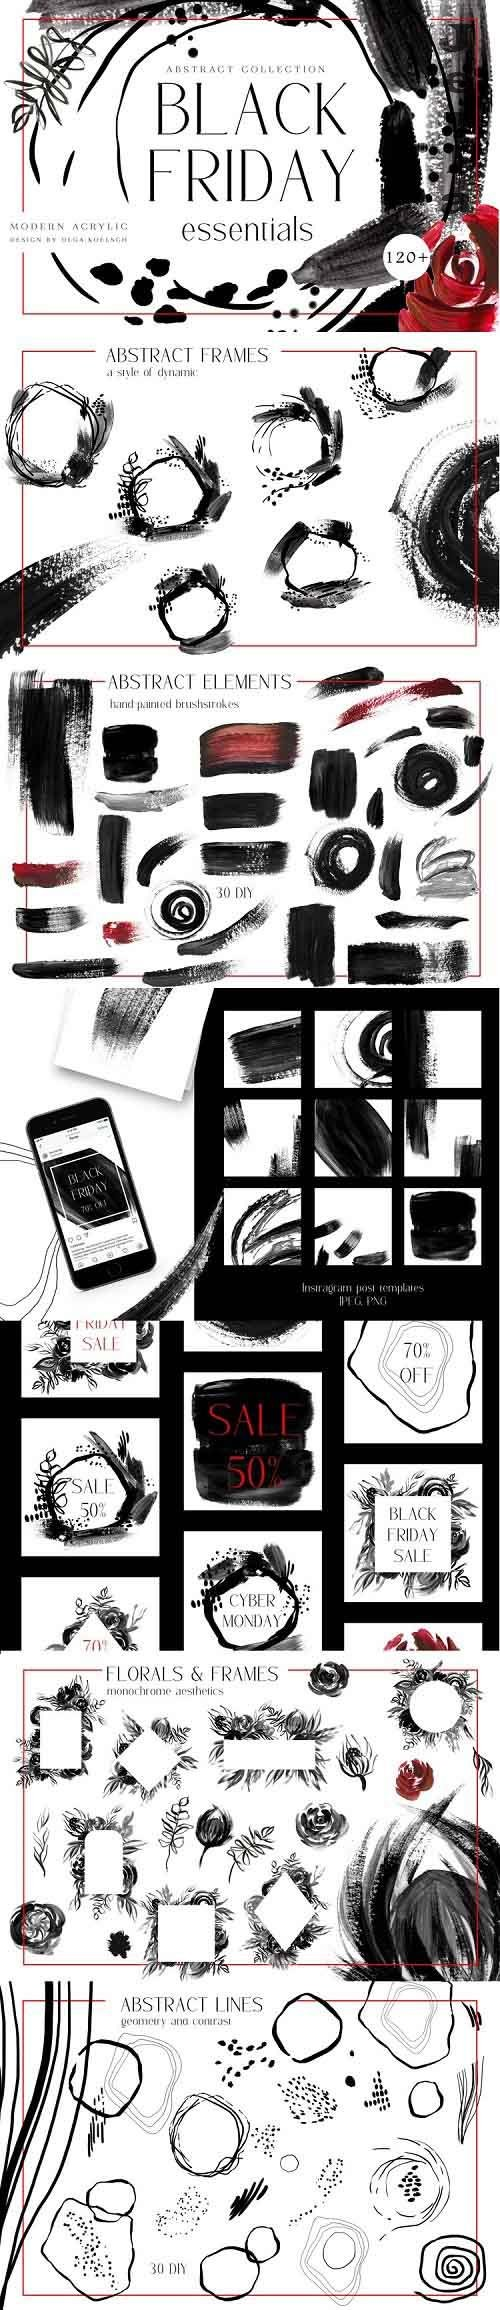 Black Friday sale templates, social media sale stickers - 1006518